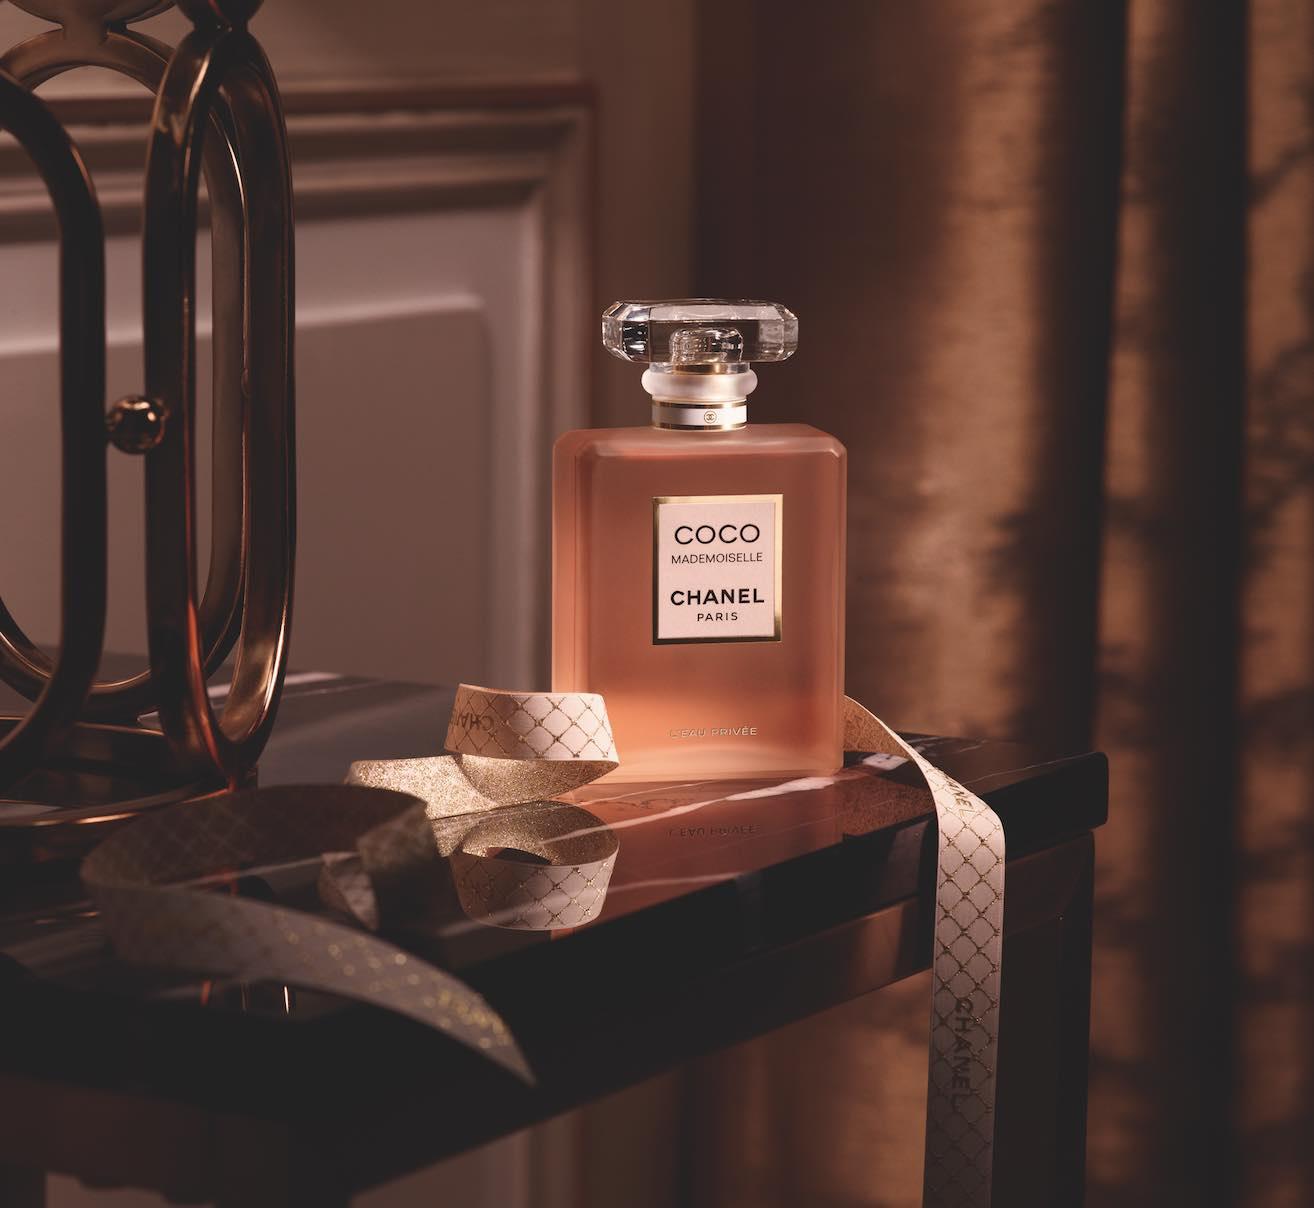 L'eau Privée, Parfum Rilisan Chanel dengan Aroma Sensual